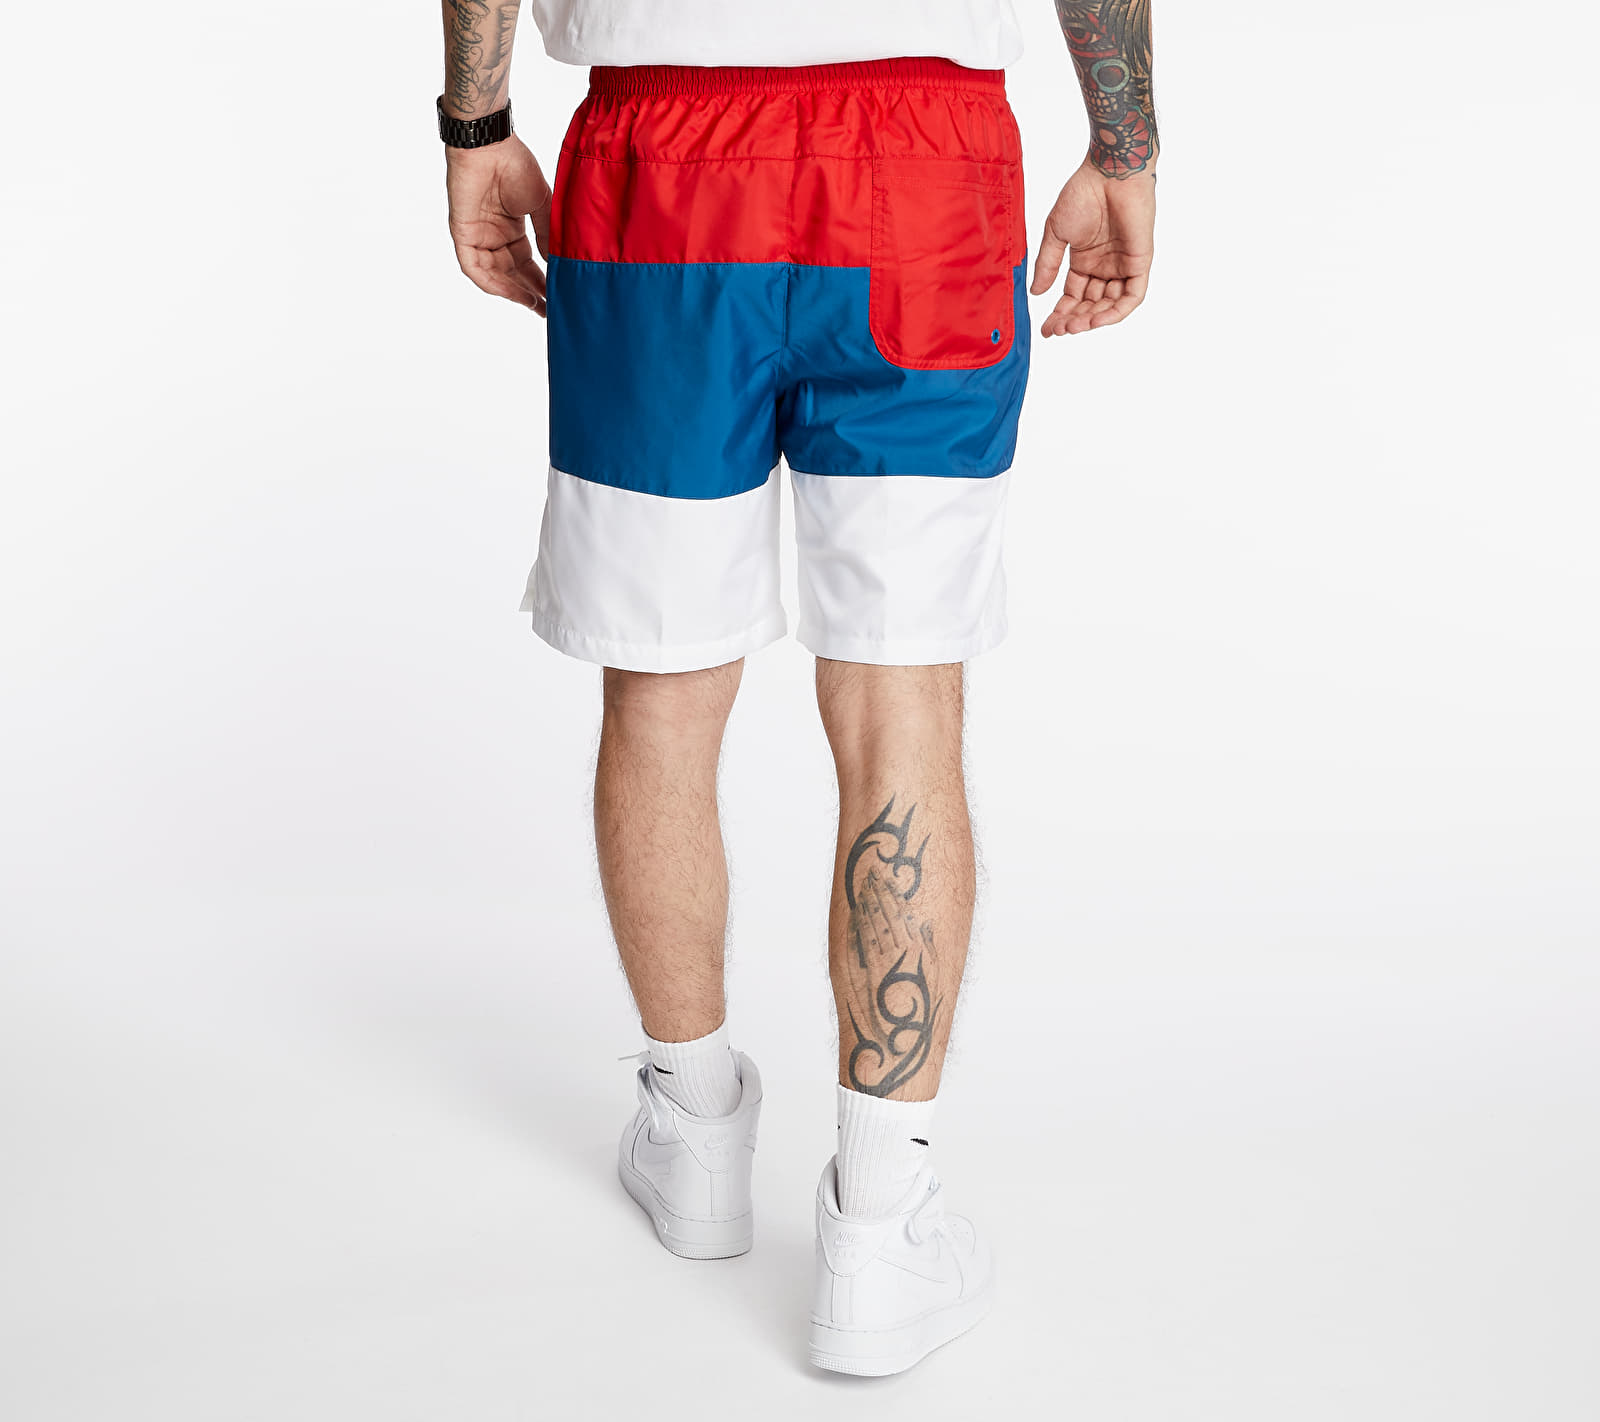 Nike Sportswear SCE Woven Nvlty Shorts University Red/ Industrial Blue/ White